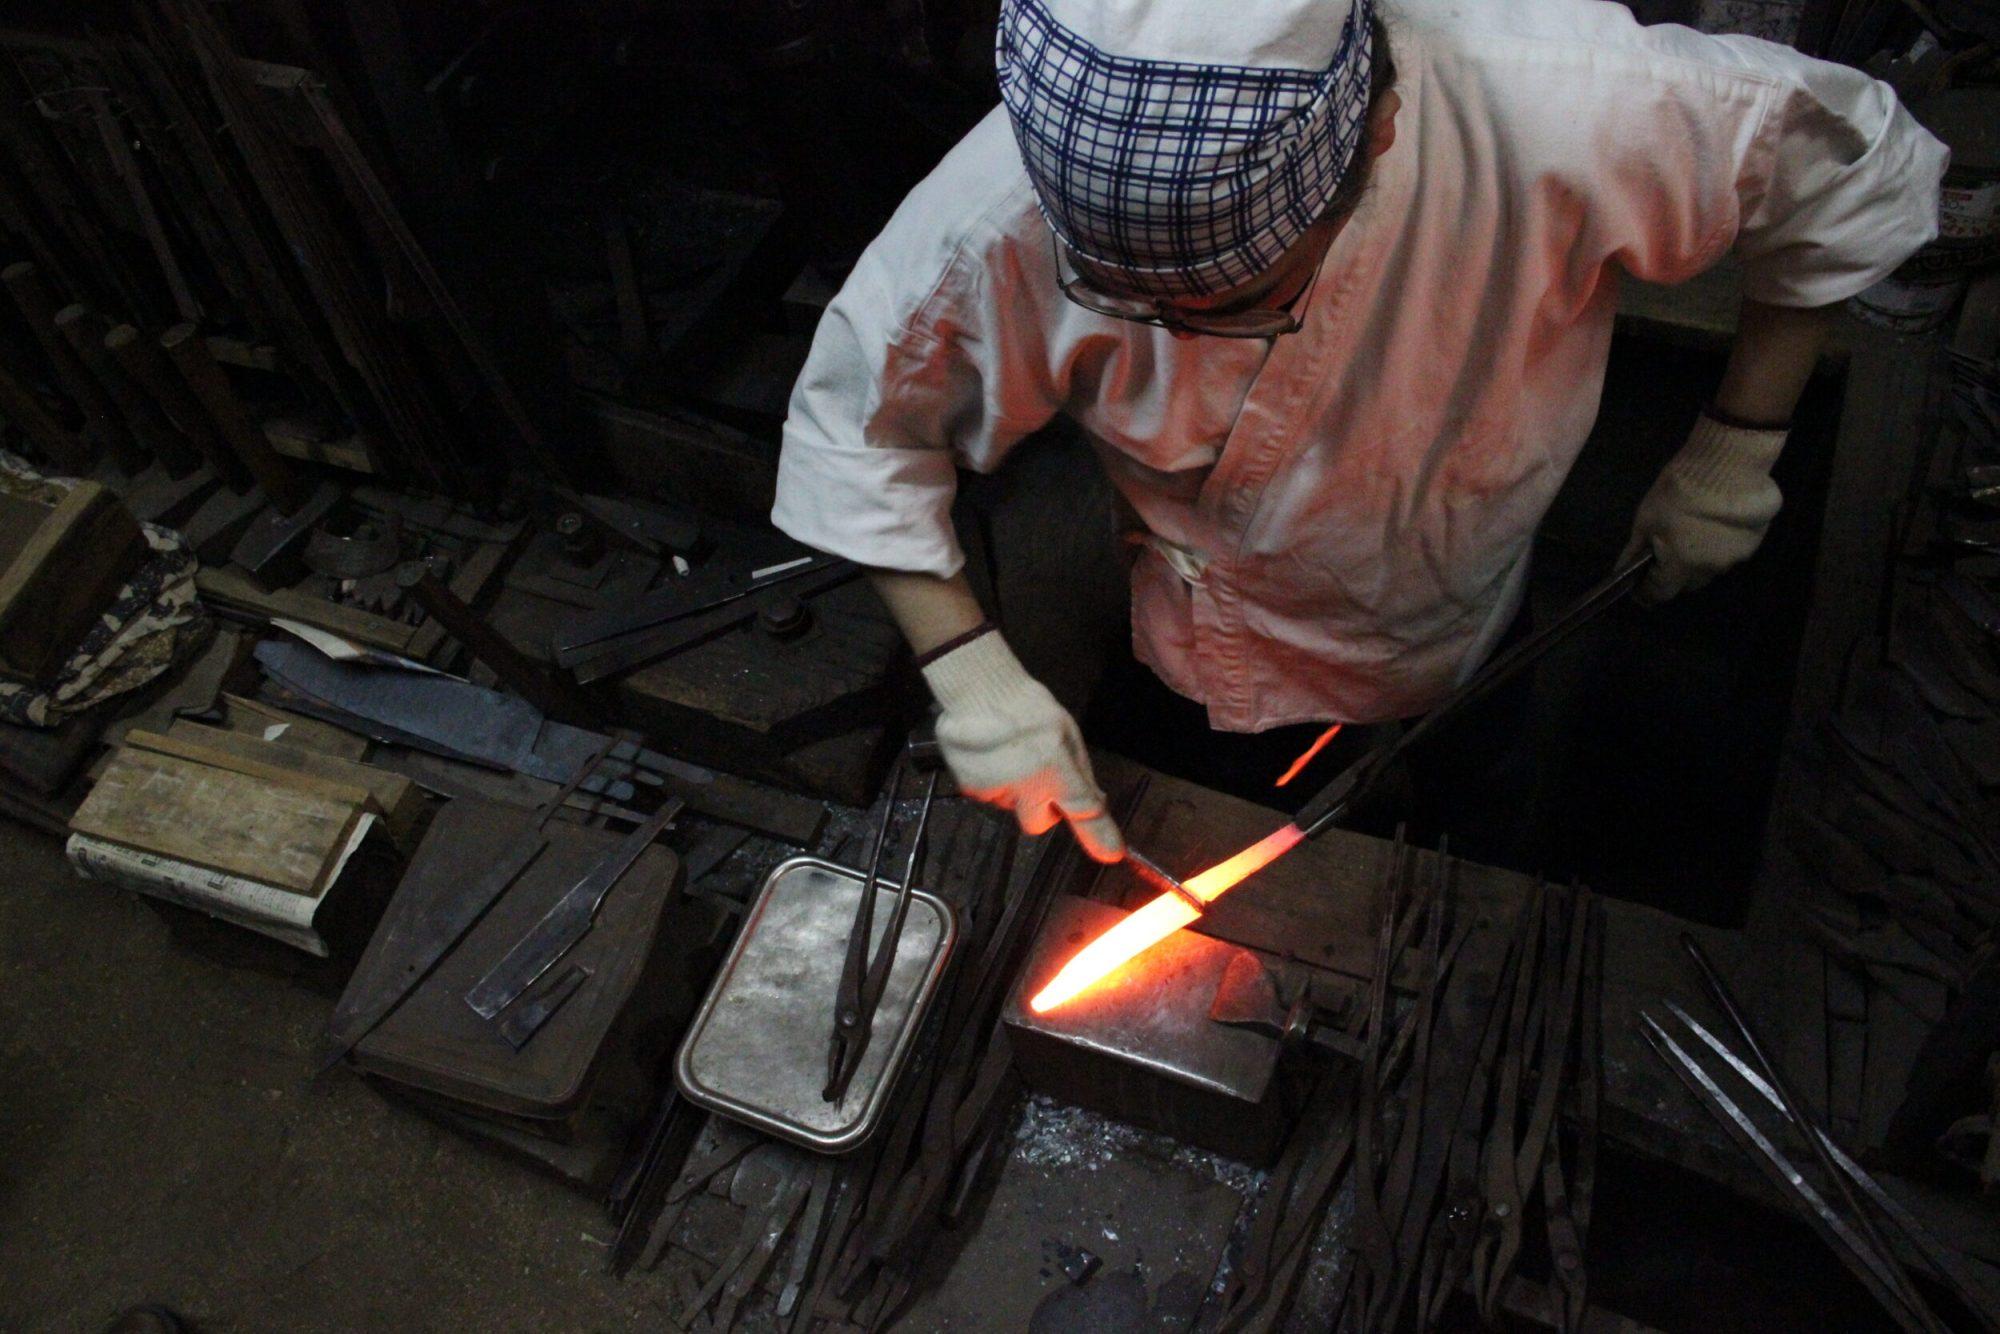 Japanese blacksmith making kitchen knives